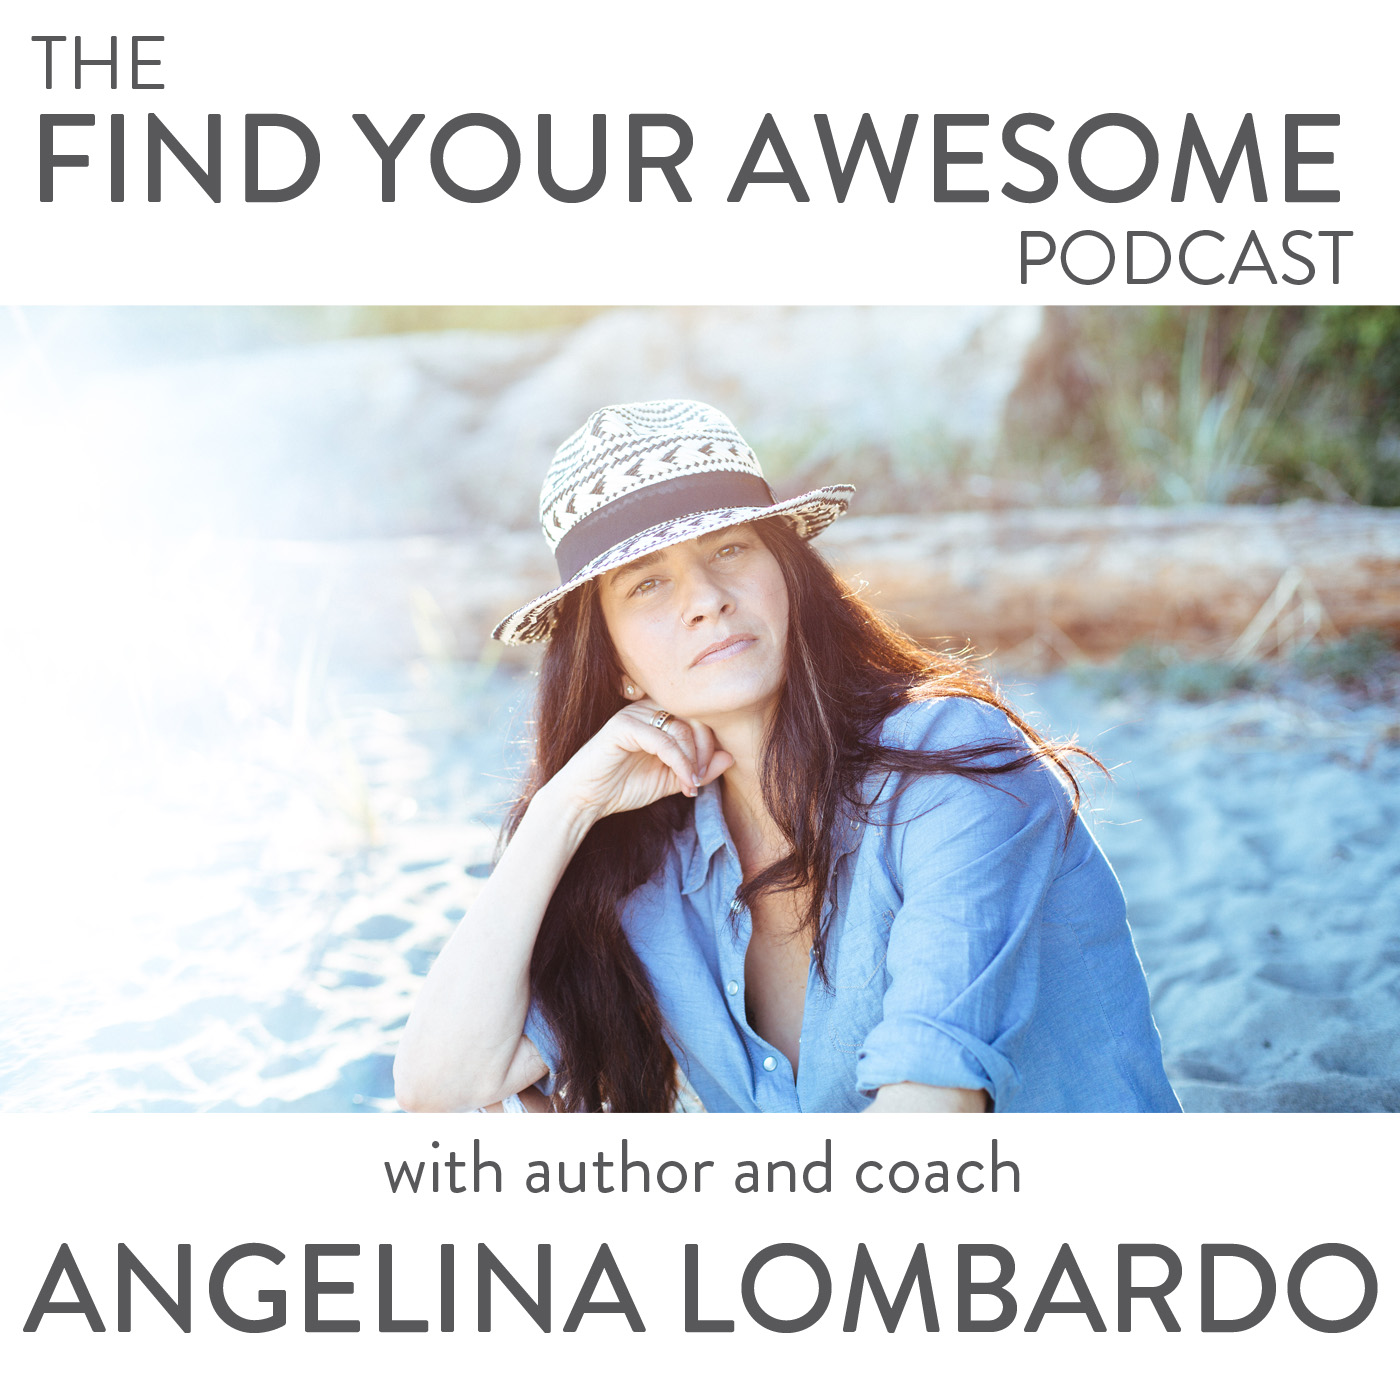 AngelinaLombardo_podcast_coverart.jpg